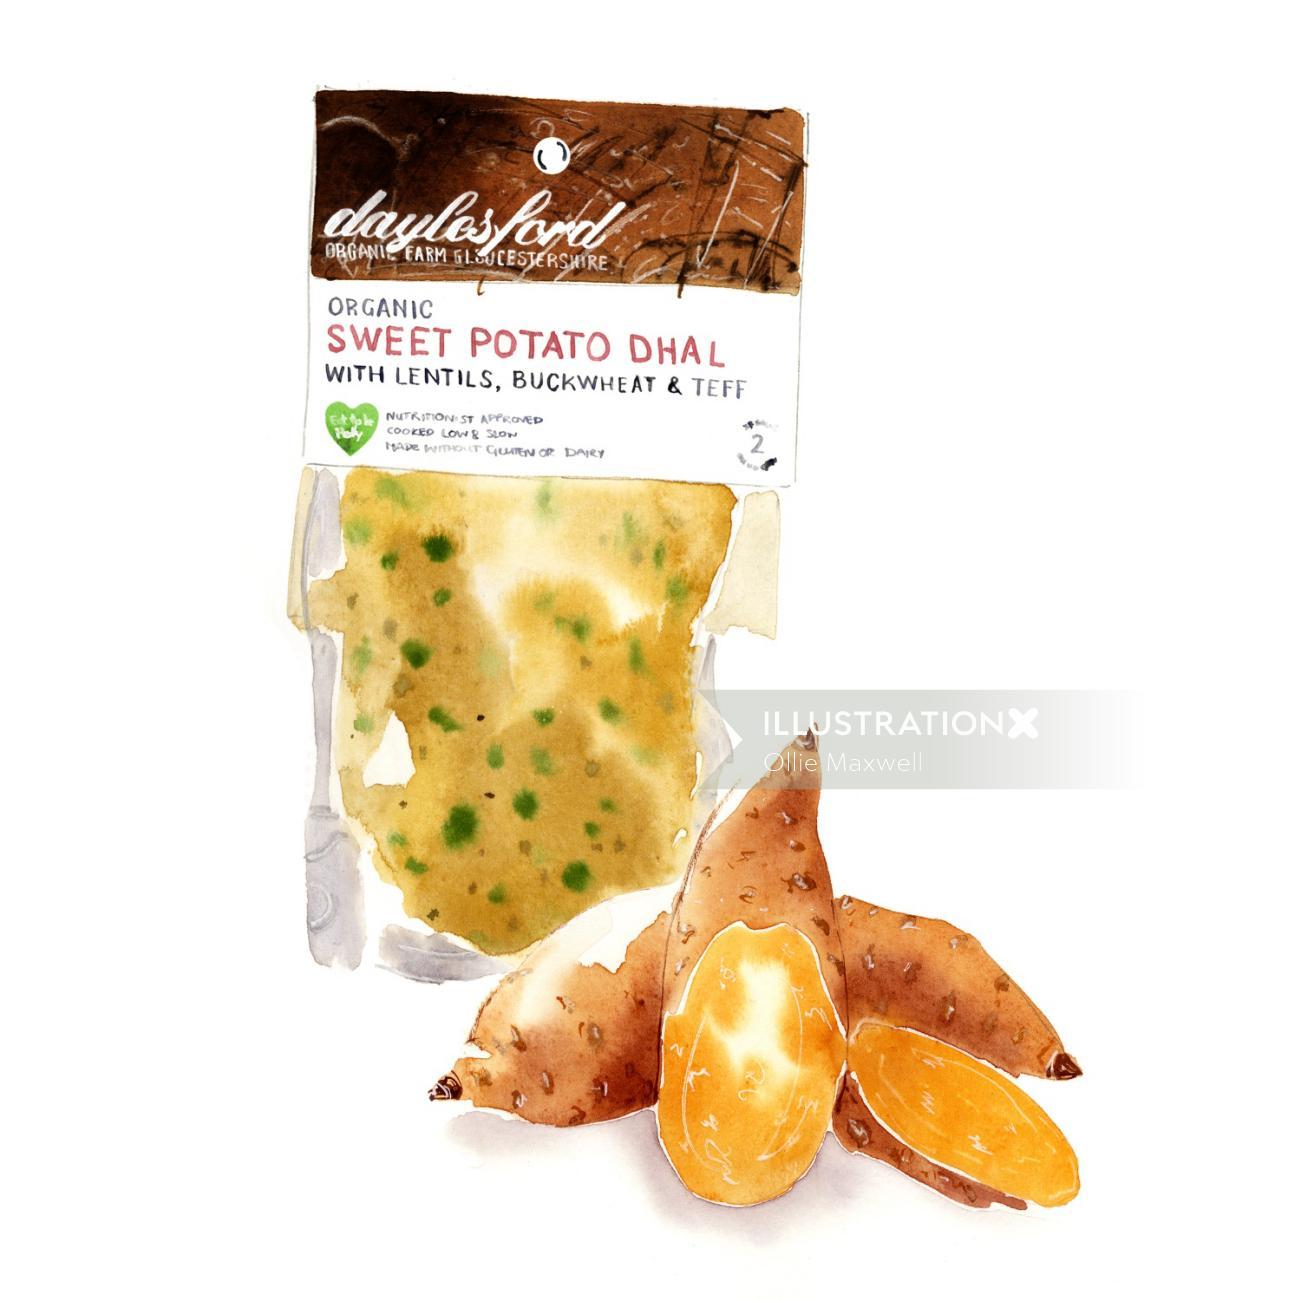 Organic sweet potato dal